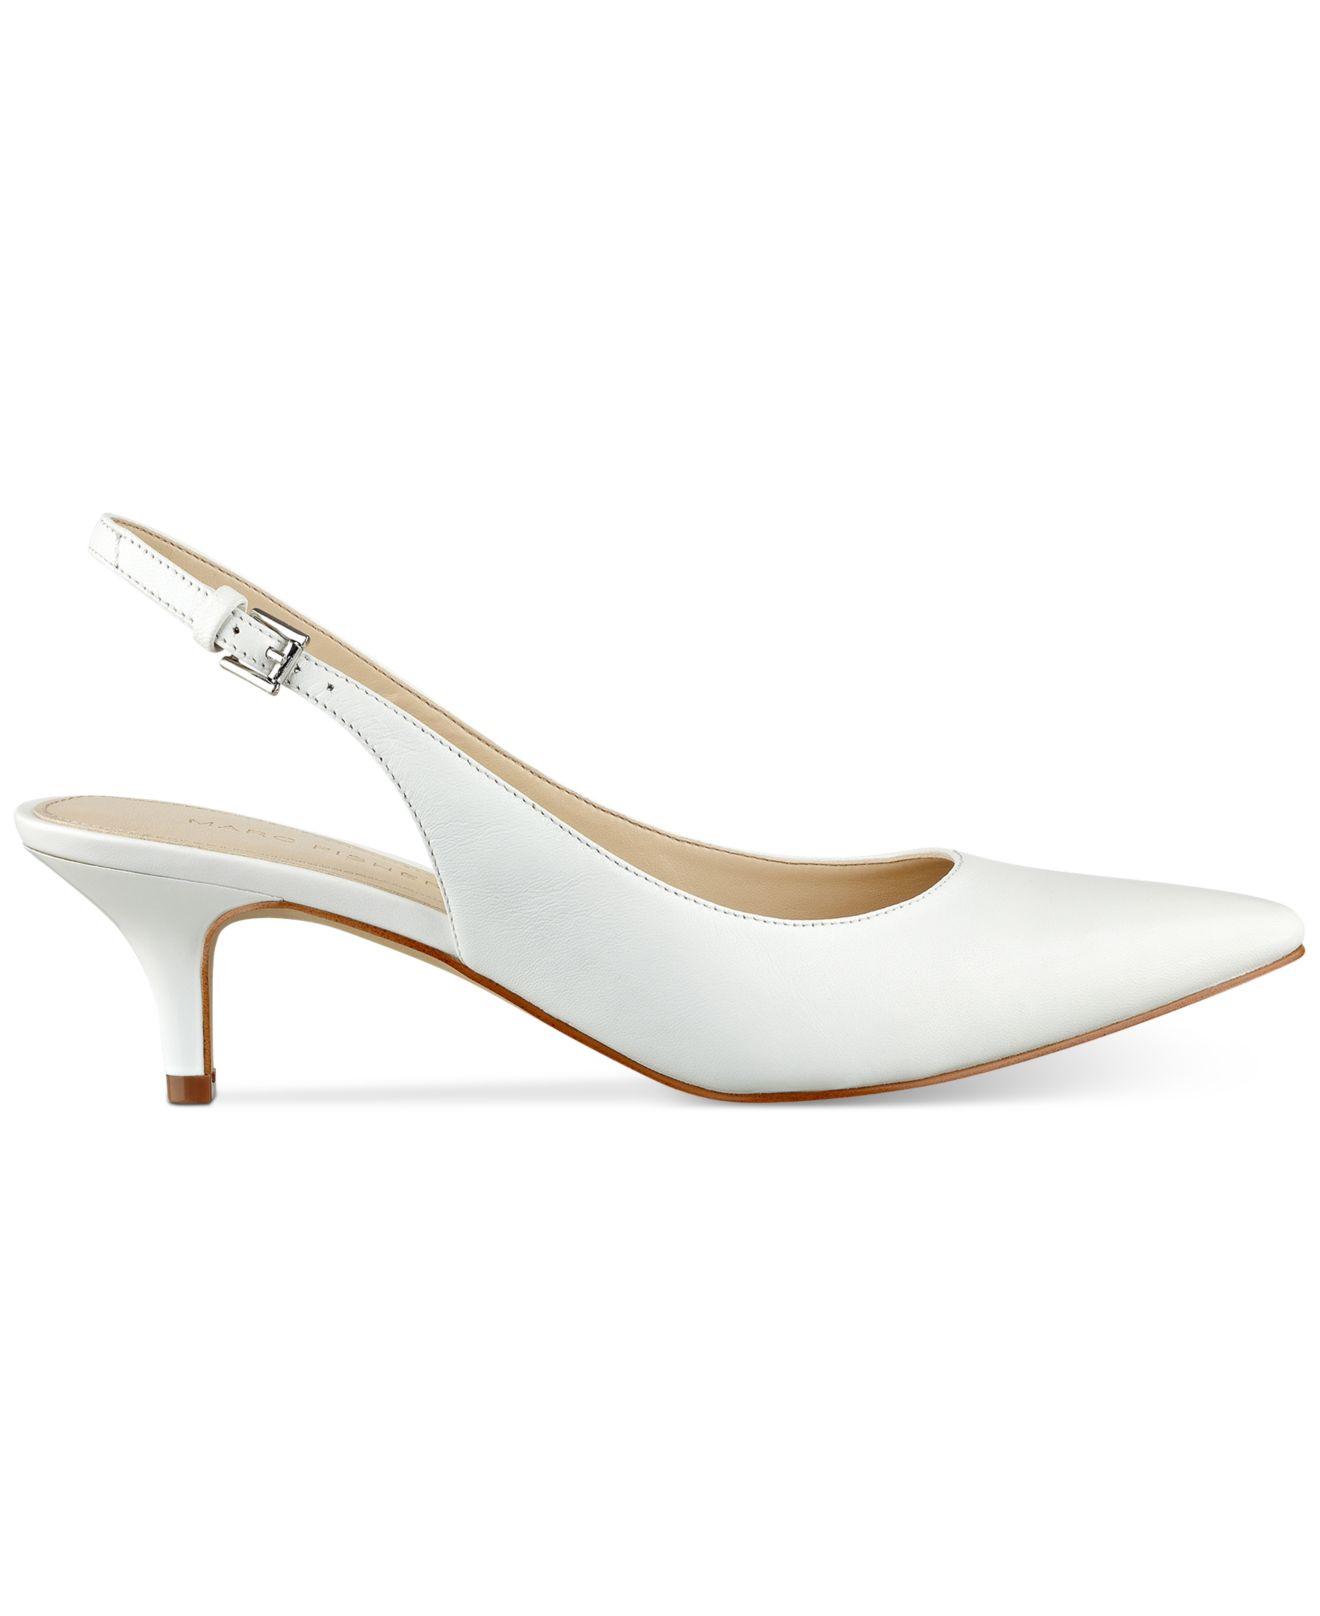 a2f98c86d528 Lyst - Marc Fisher Tiffani Kitten-heel Slingback Pumps in White